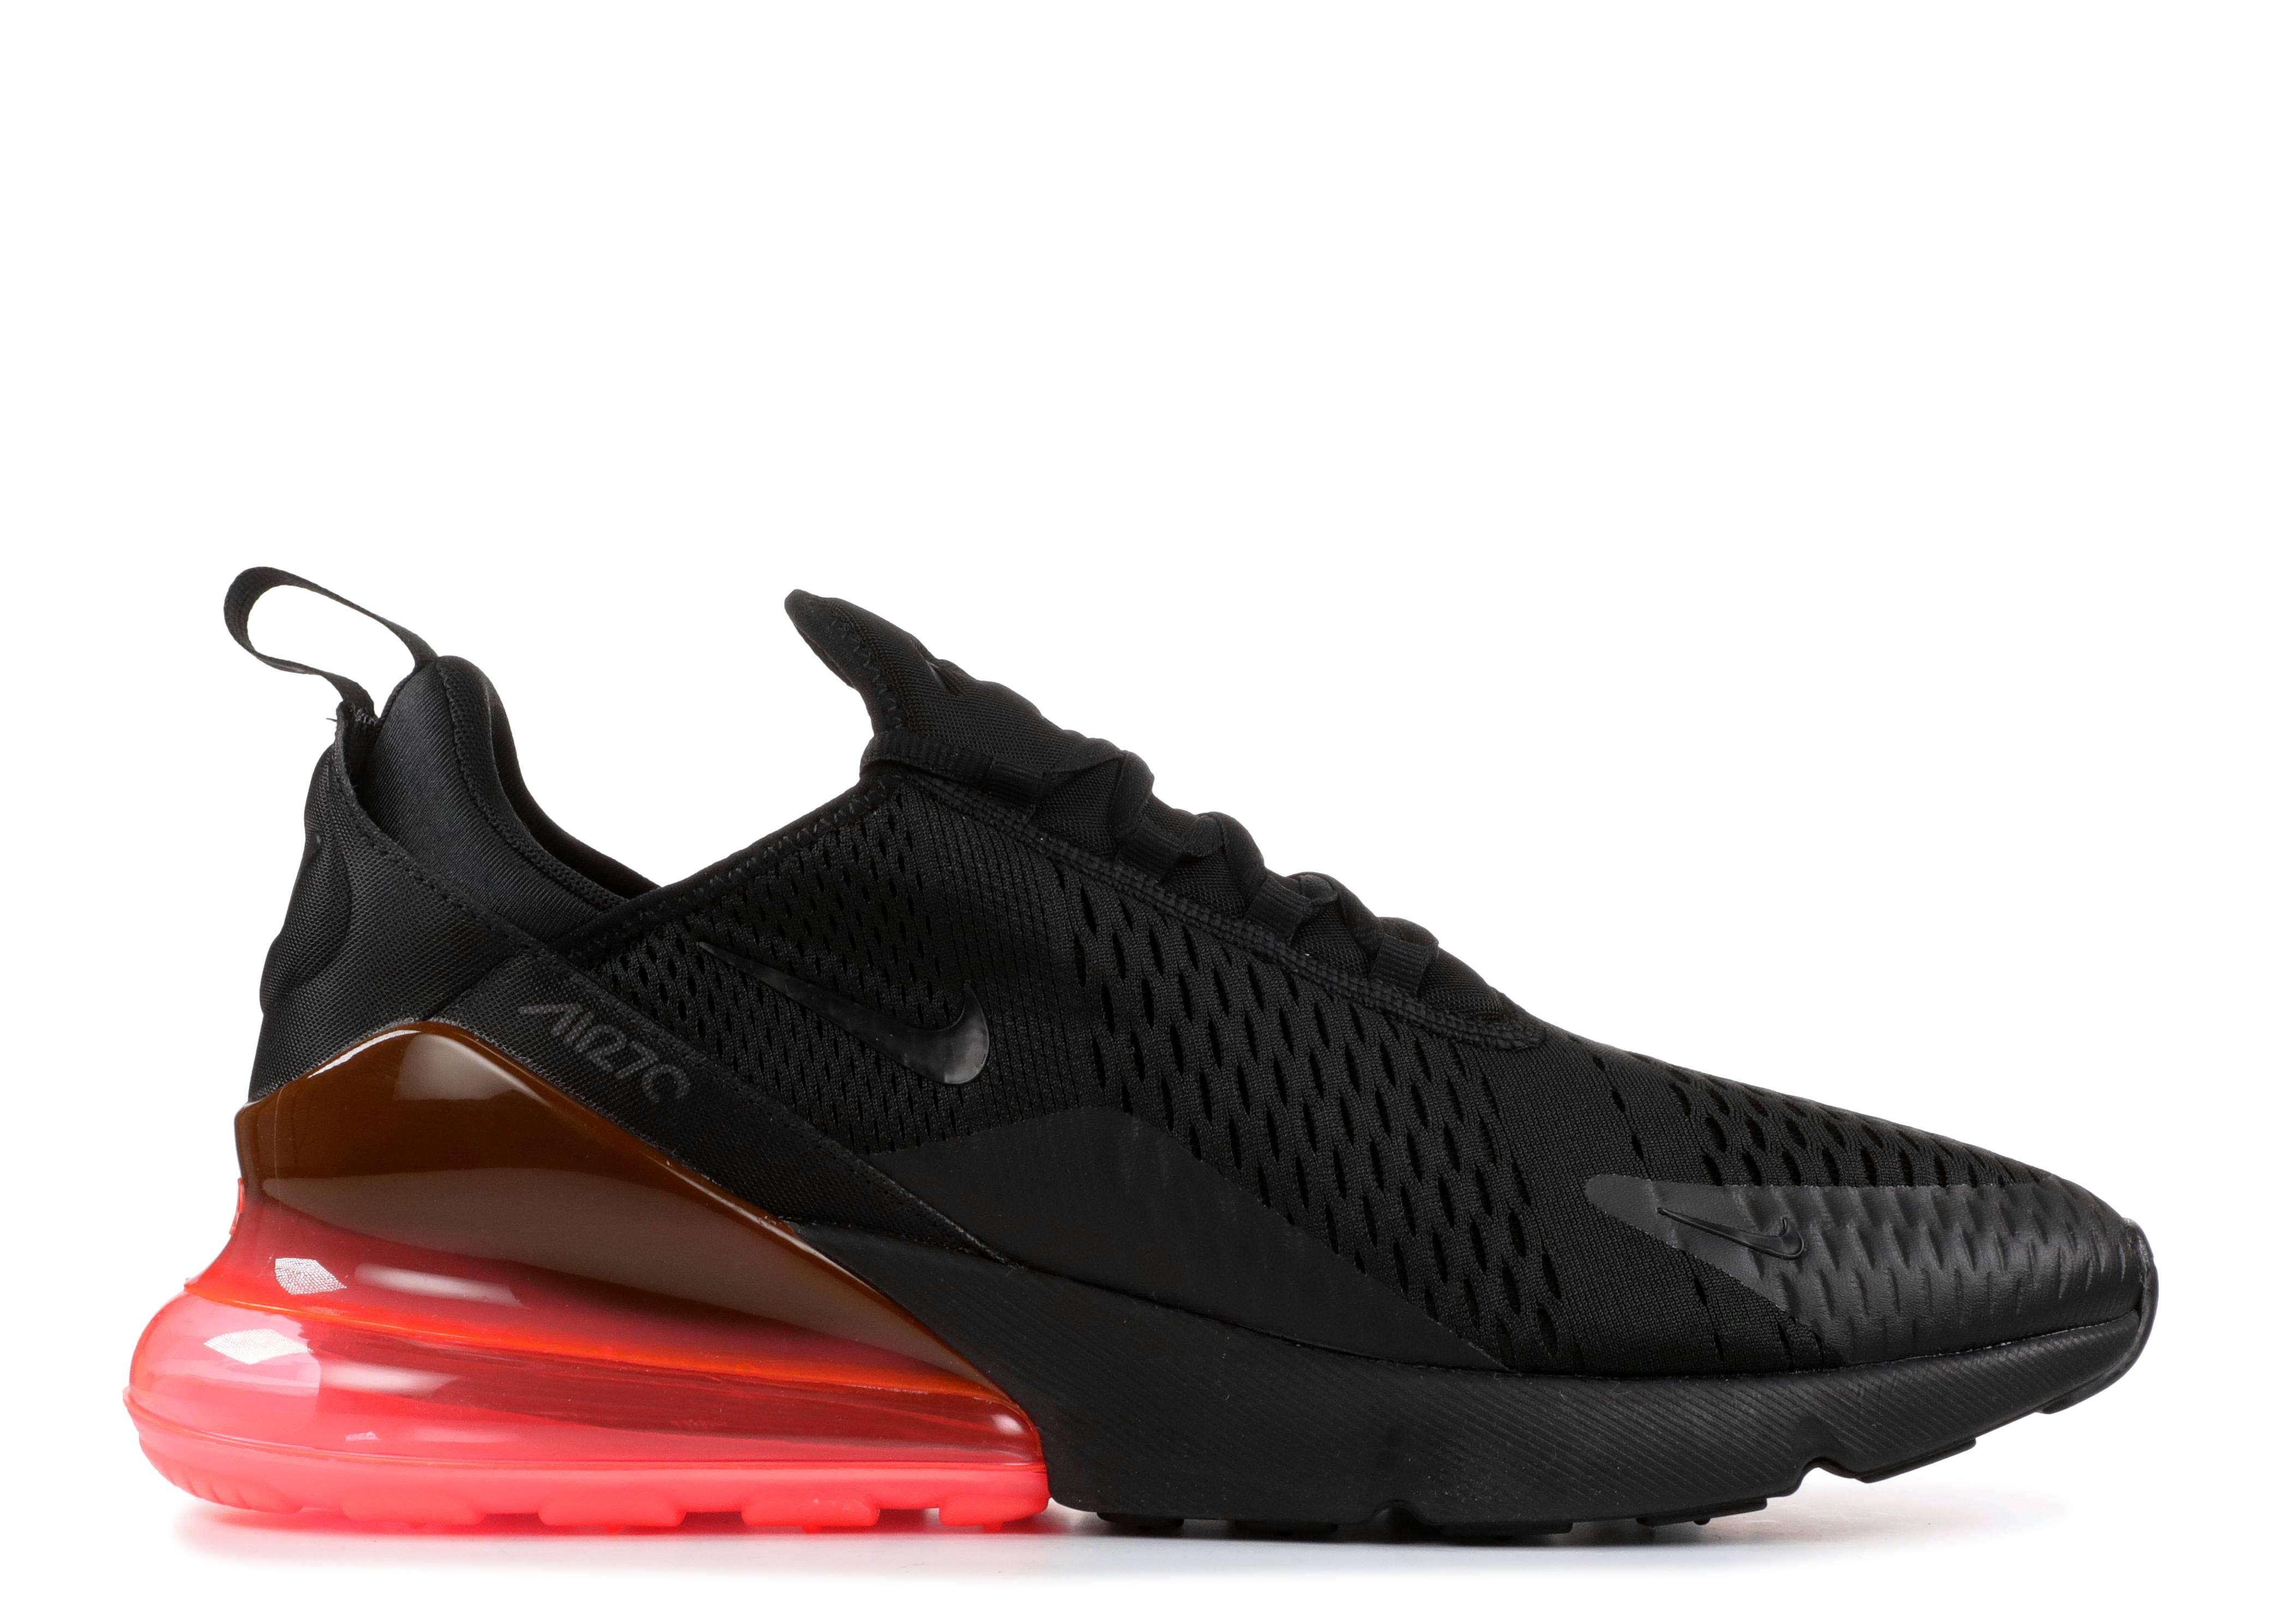 d930a0ed7aa6f1 AIR MAX 270 - Nike - ah8050 010 - black black-hot punch